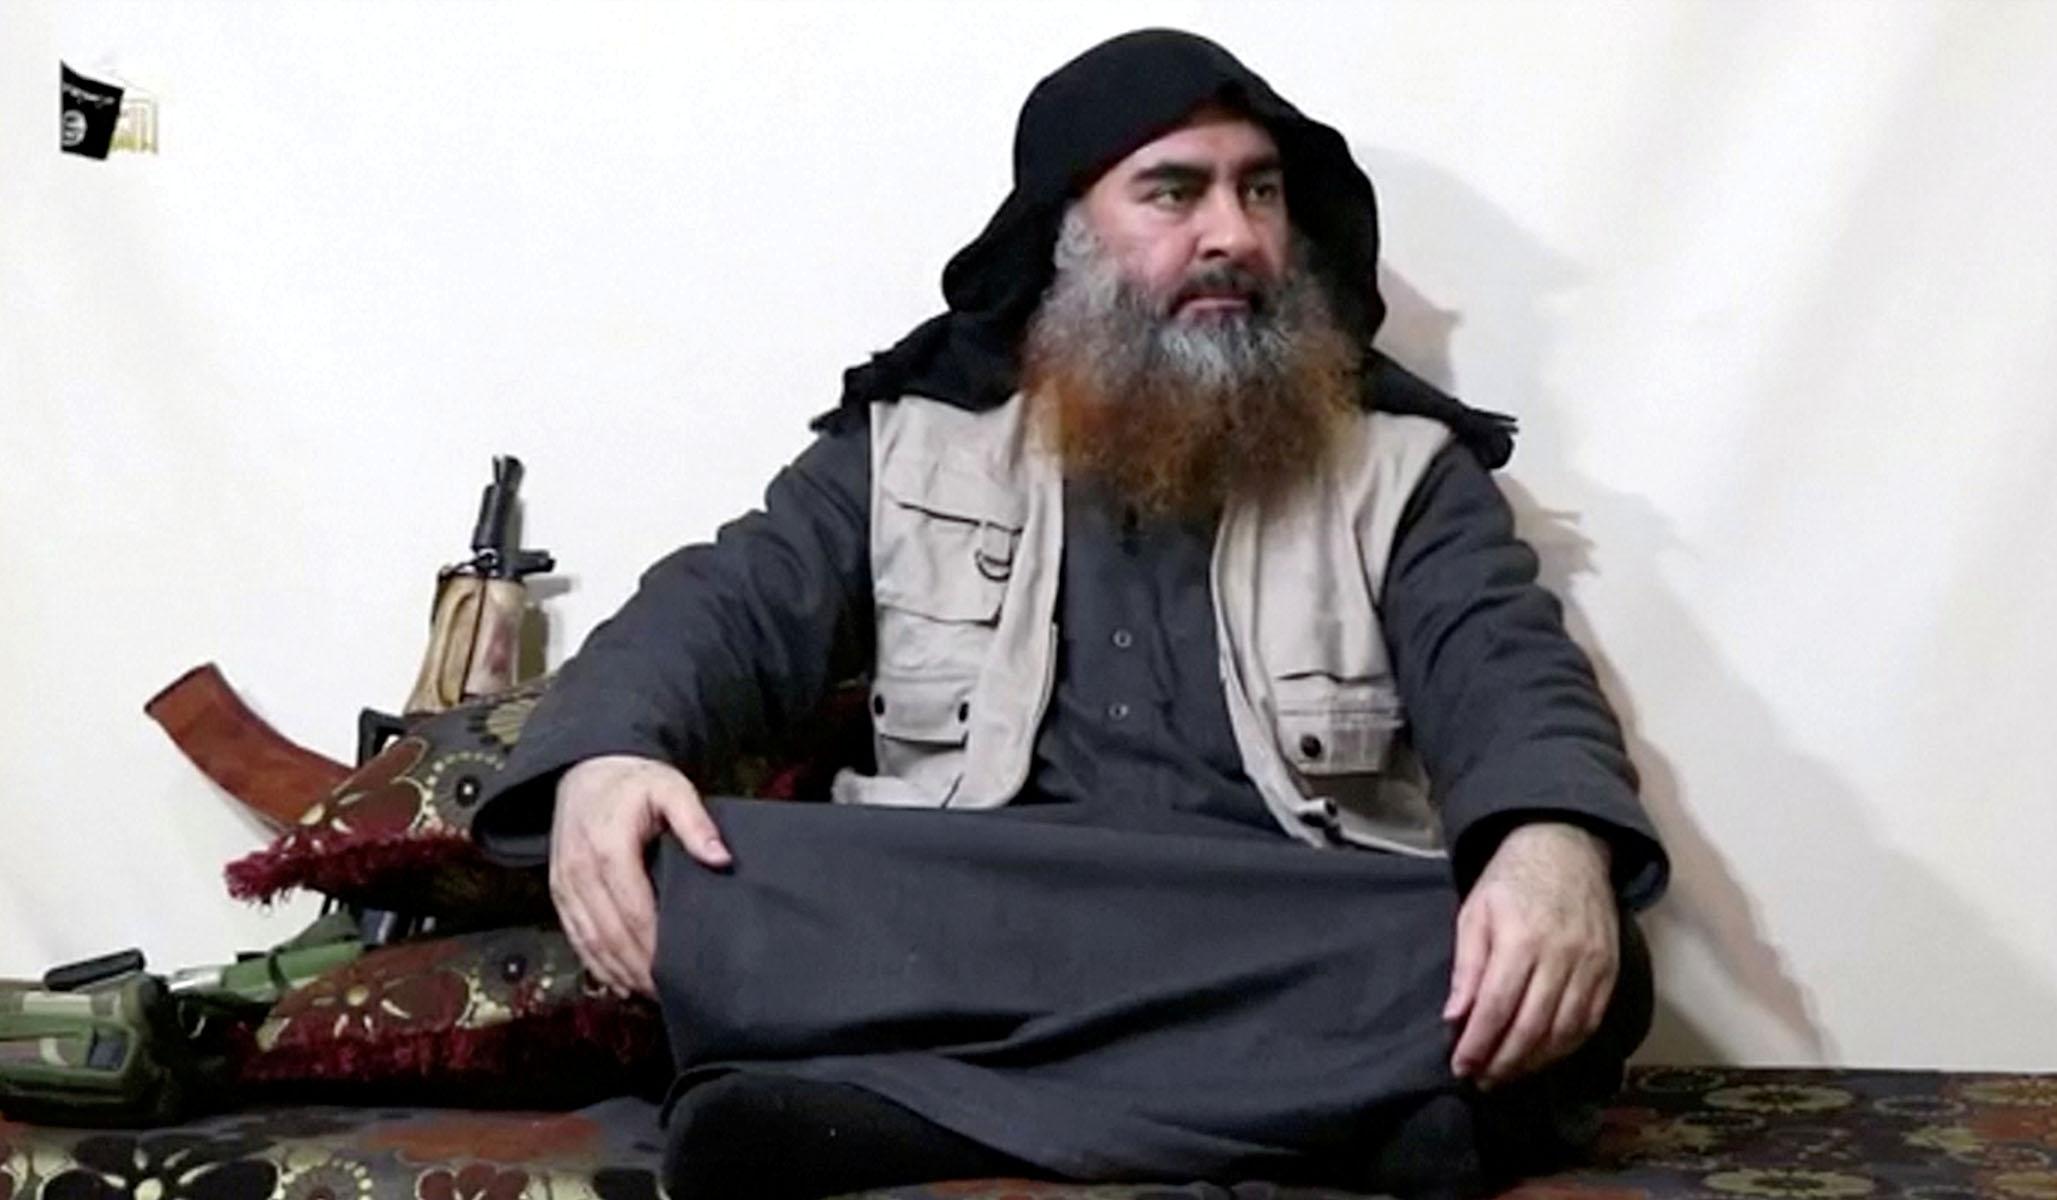 Austere Jihadist Terrorist Abu Bakr al-Baghdadi Is Dead